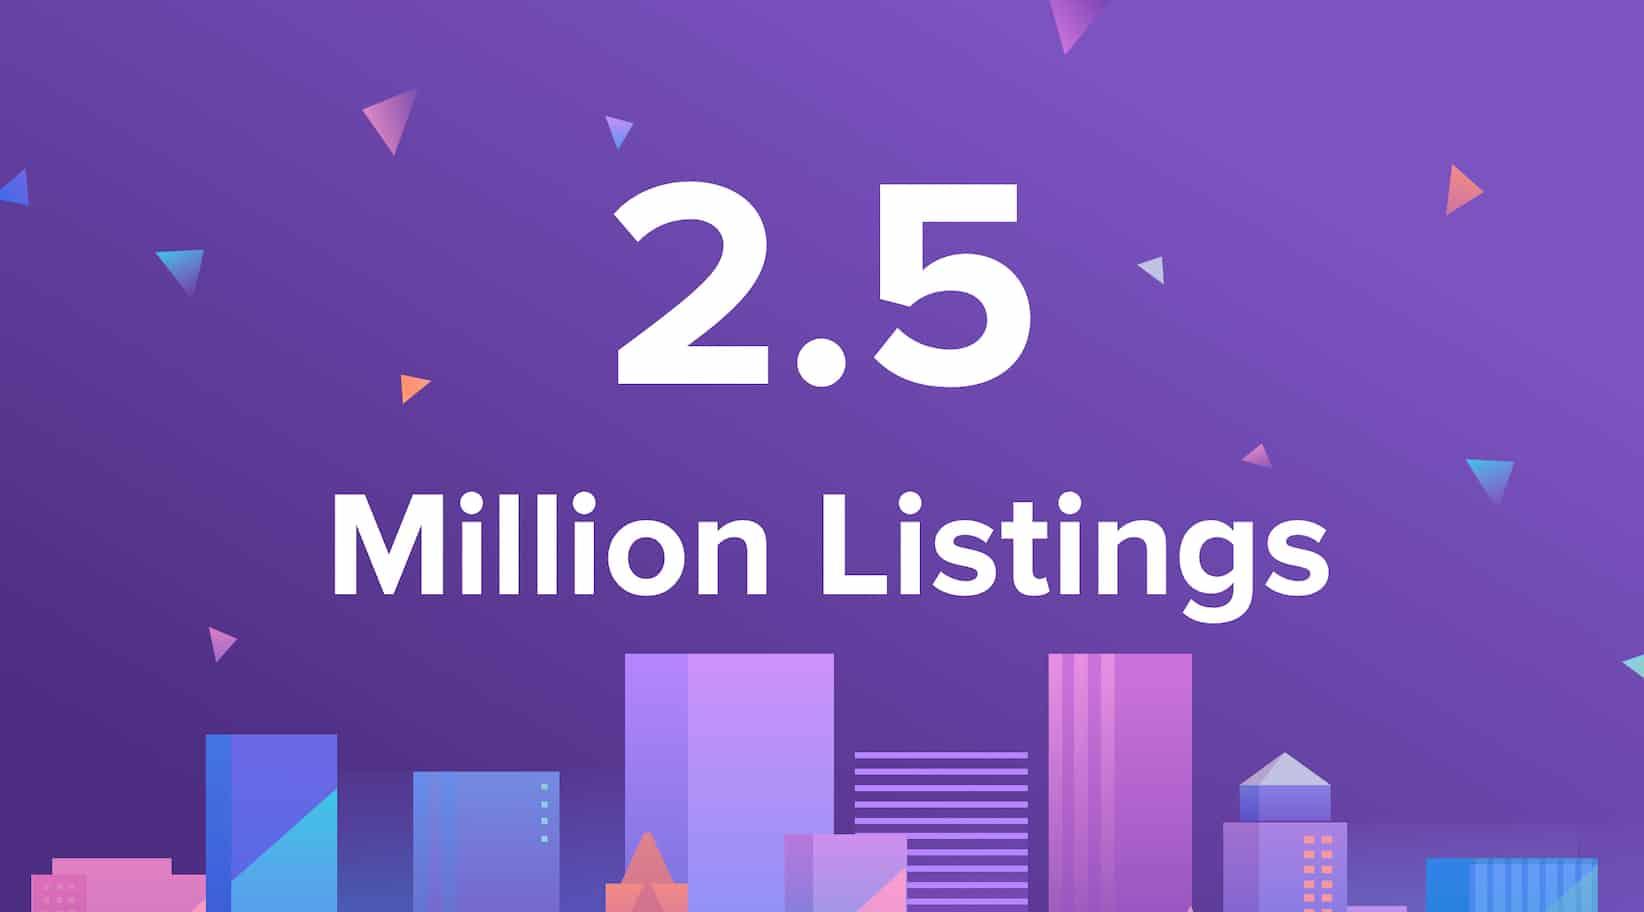 2.5 million listings on Rentberry